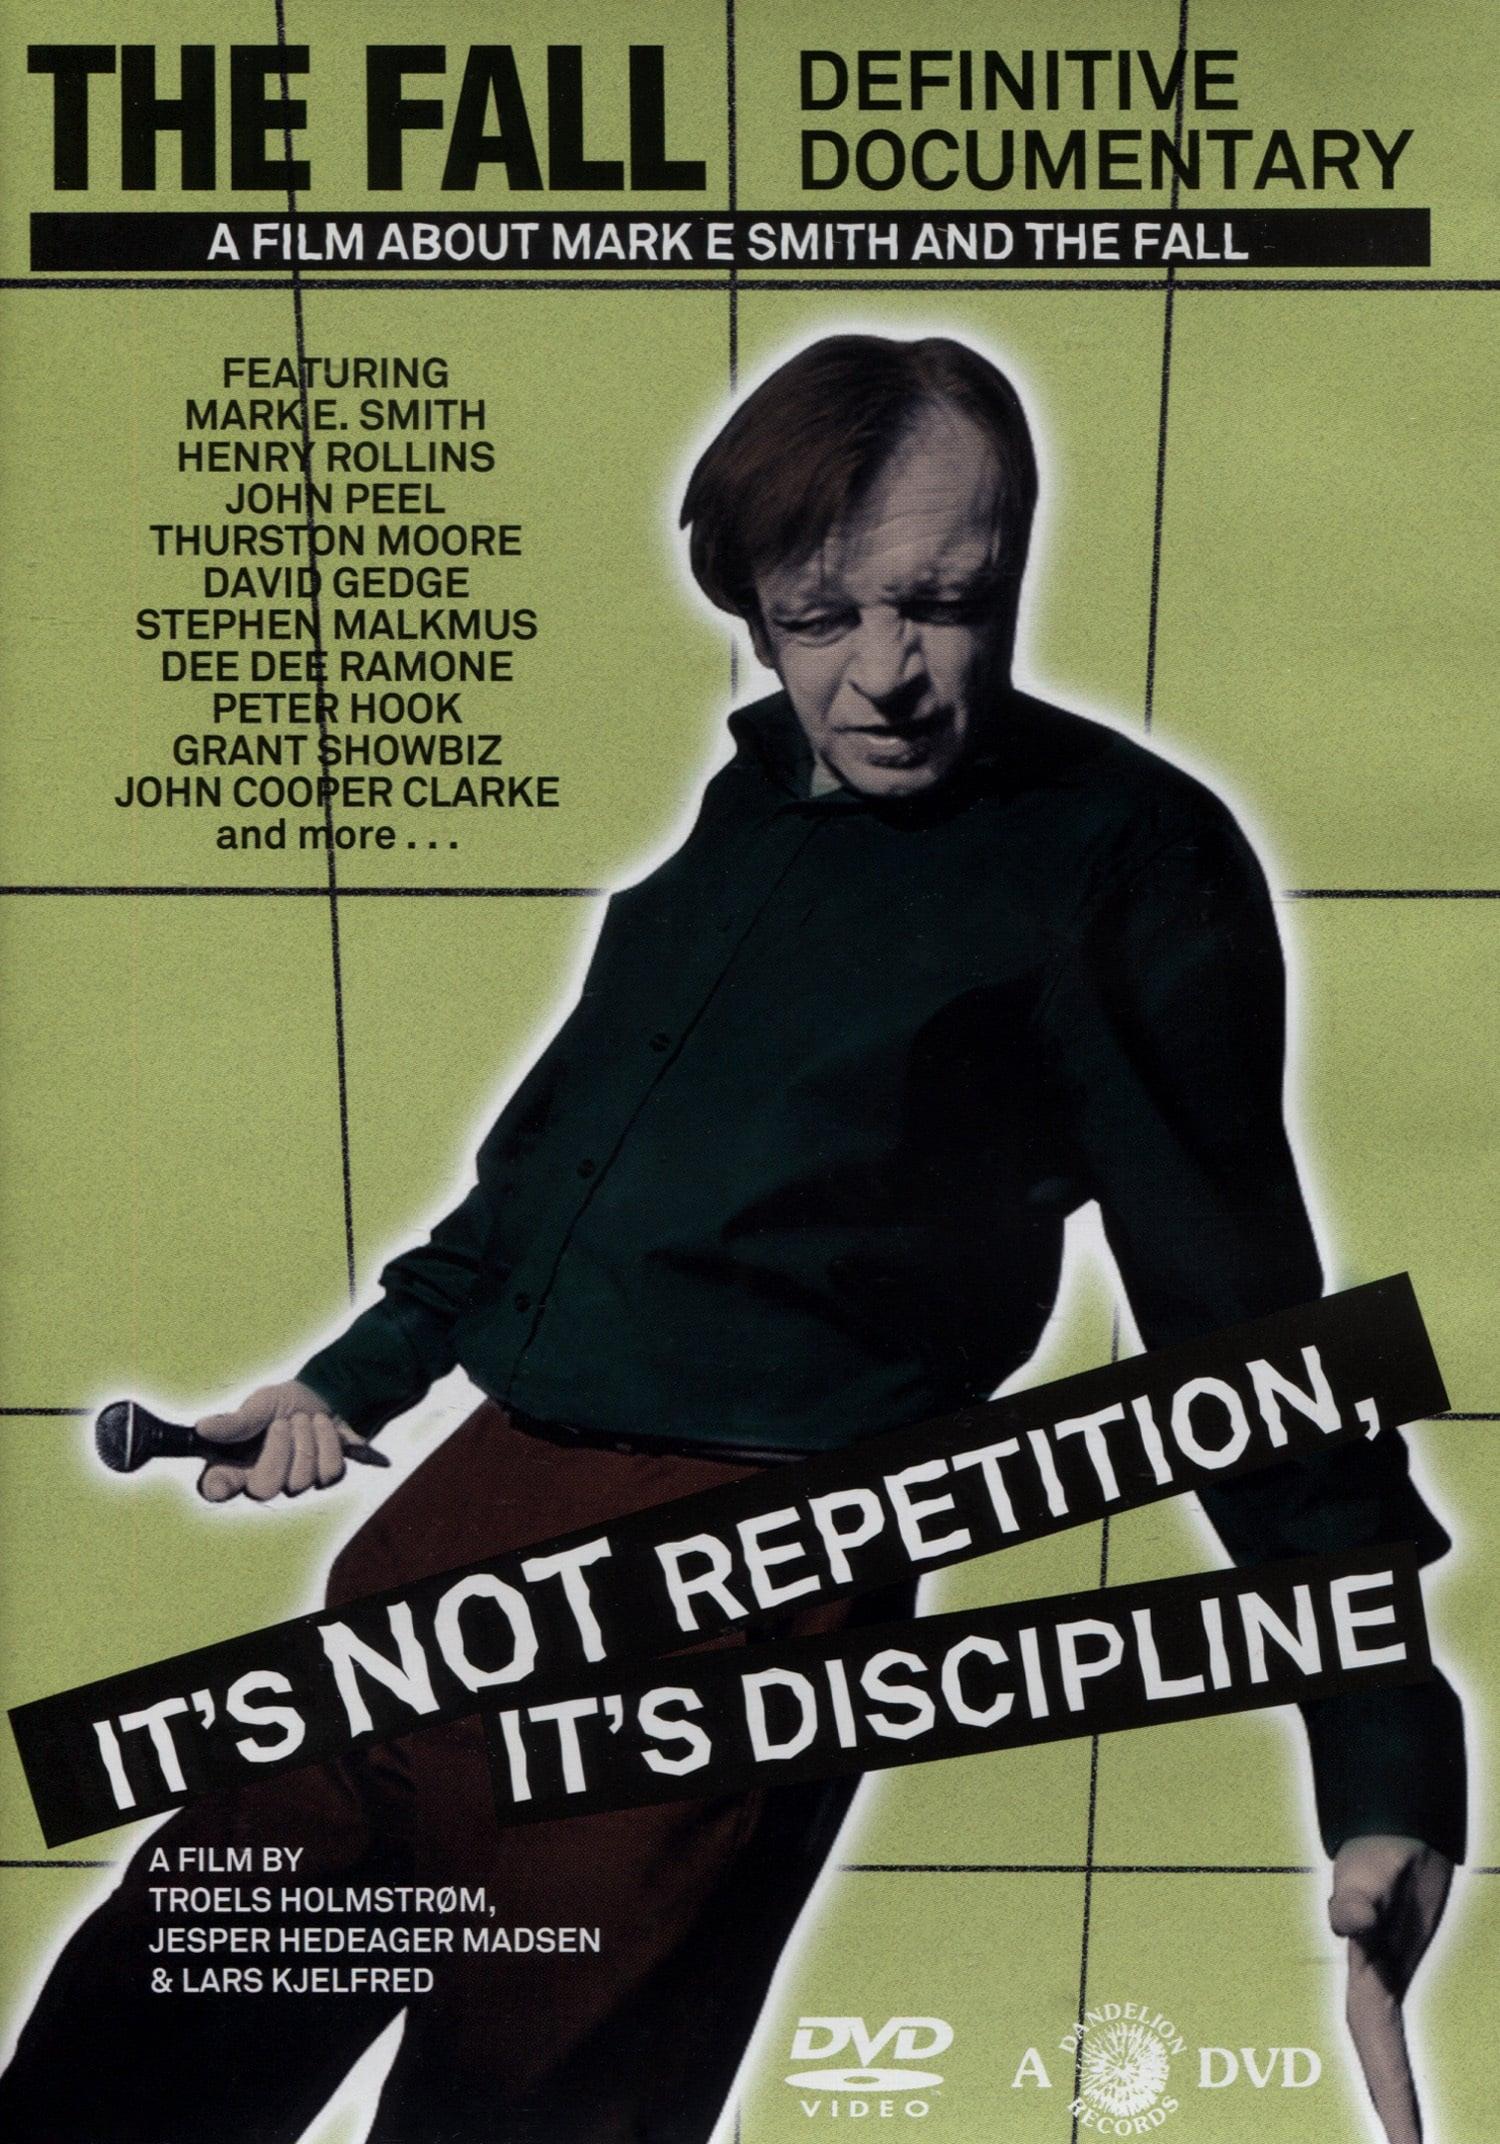 It's Not Repetition, It's Discipline (2015)